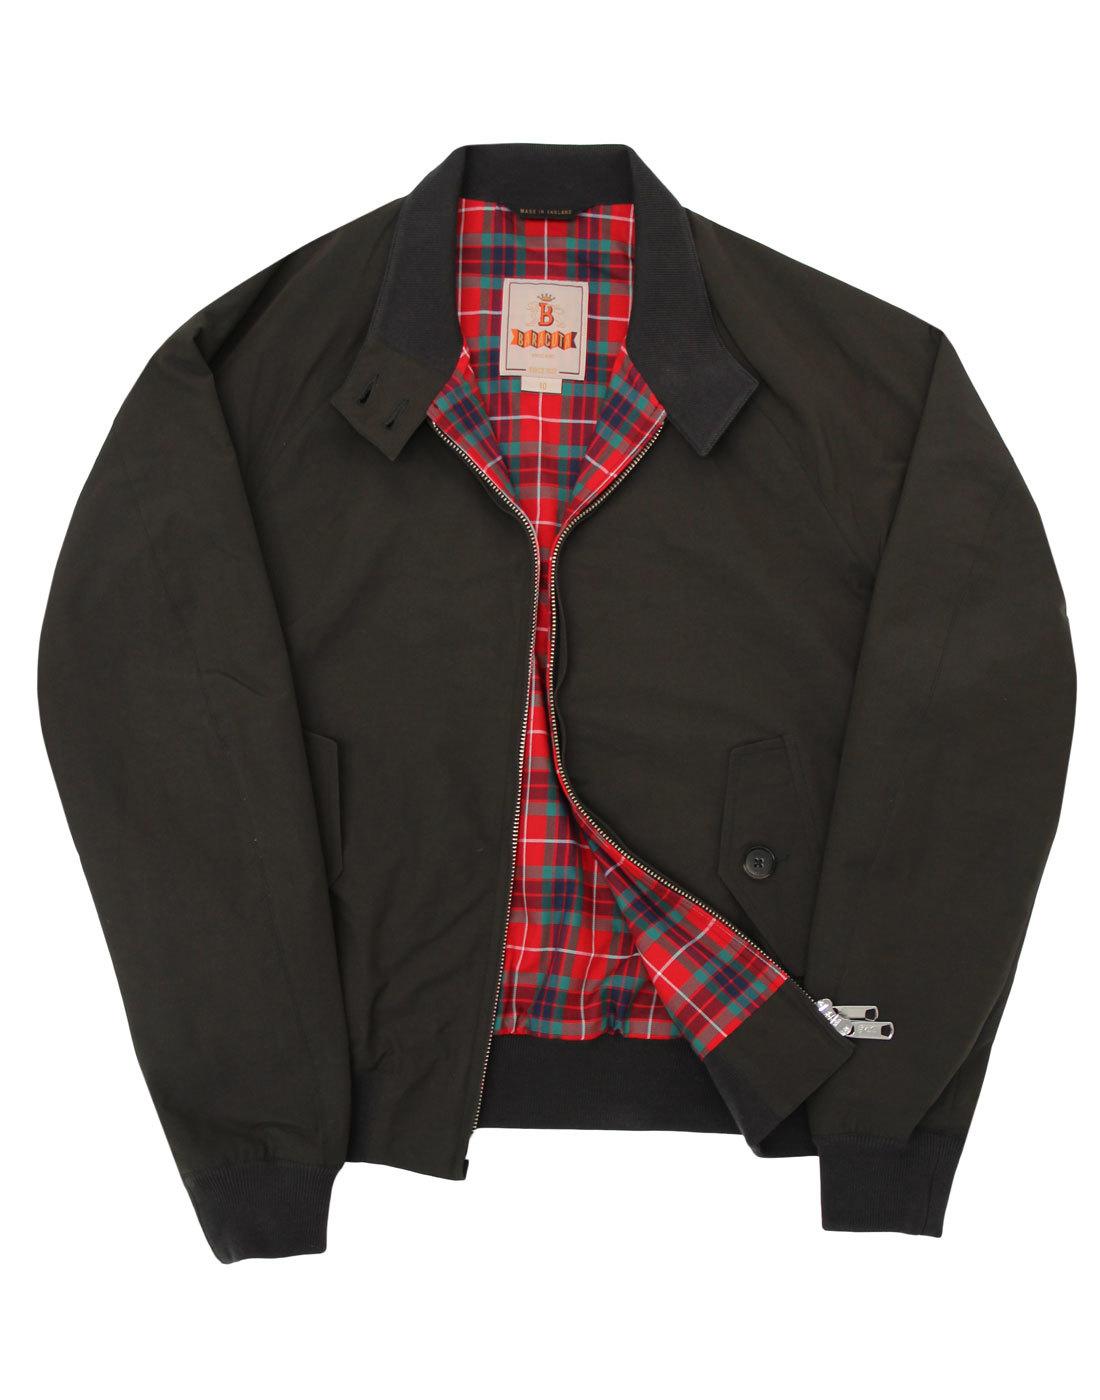 Baracuta Womens G9 Made in England Harrington Jacket Faded Black 9f5fa94acd